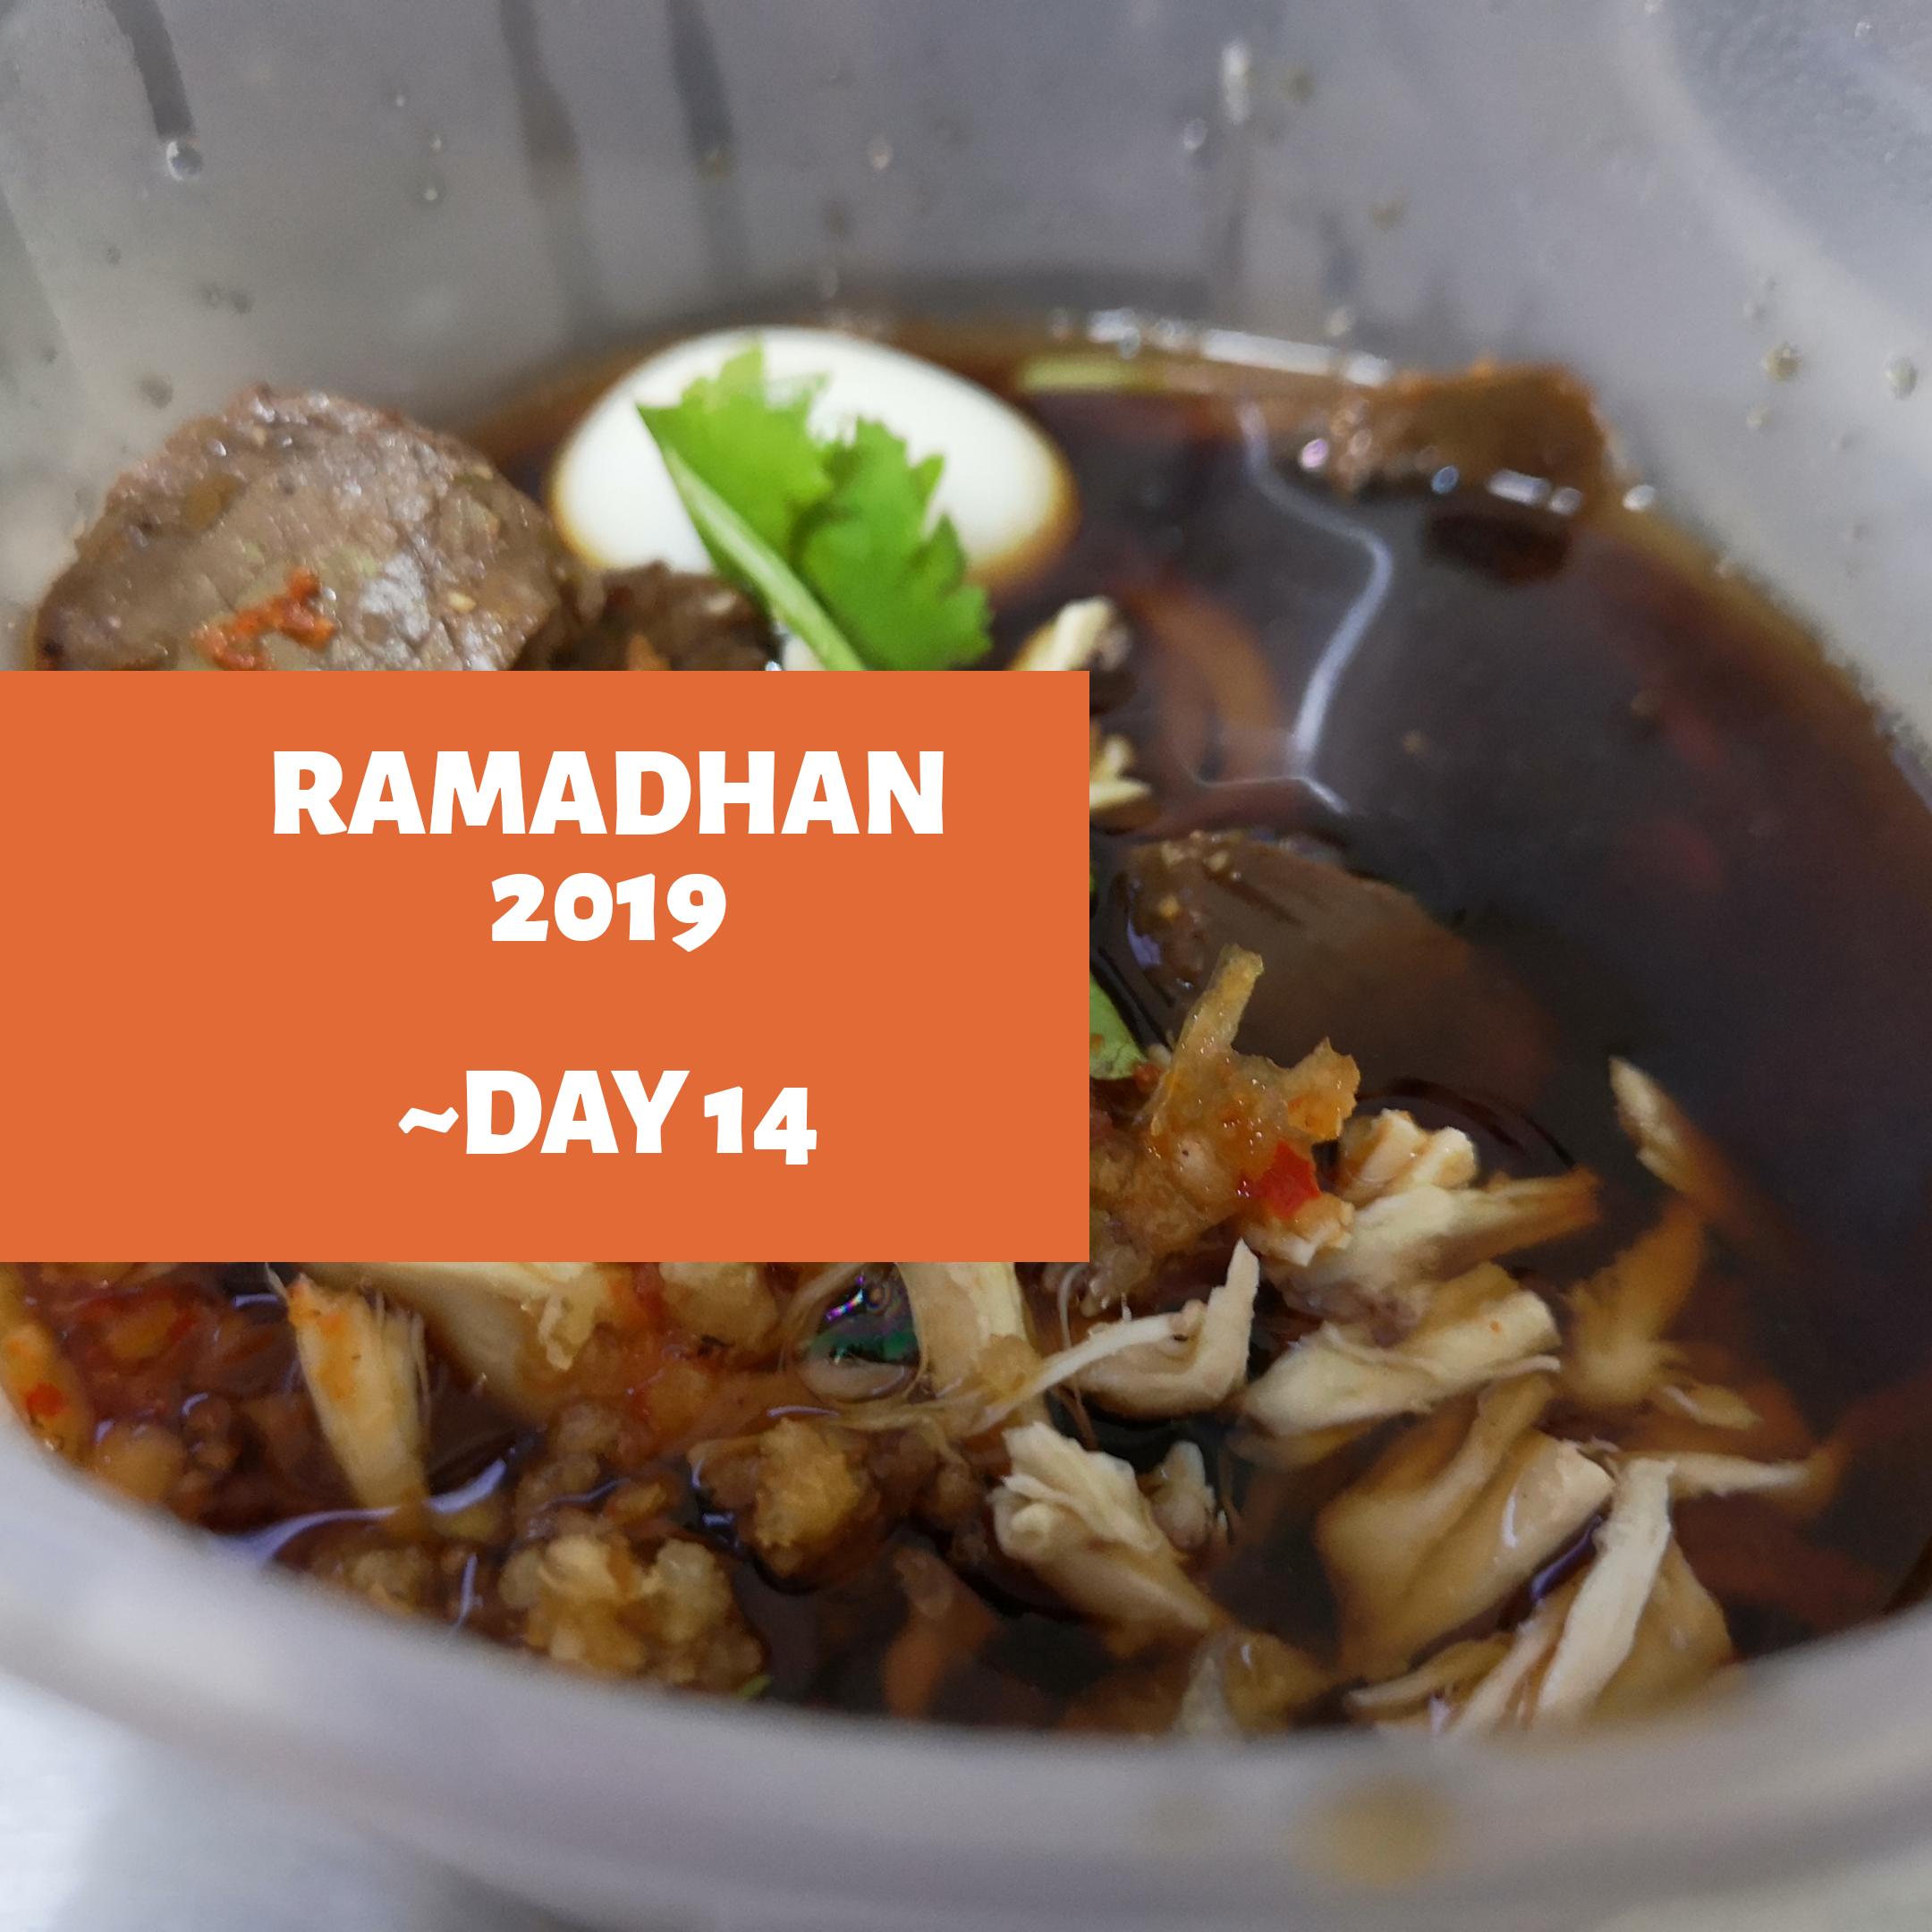 Ramadhan 2019 – Day 14